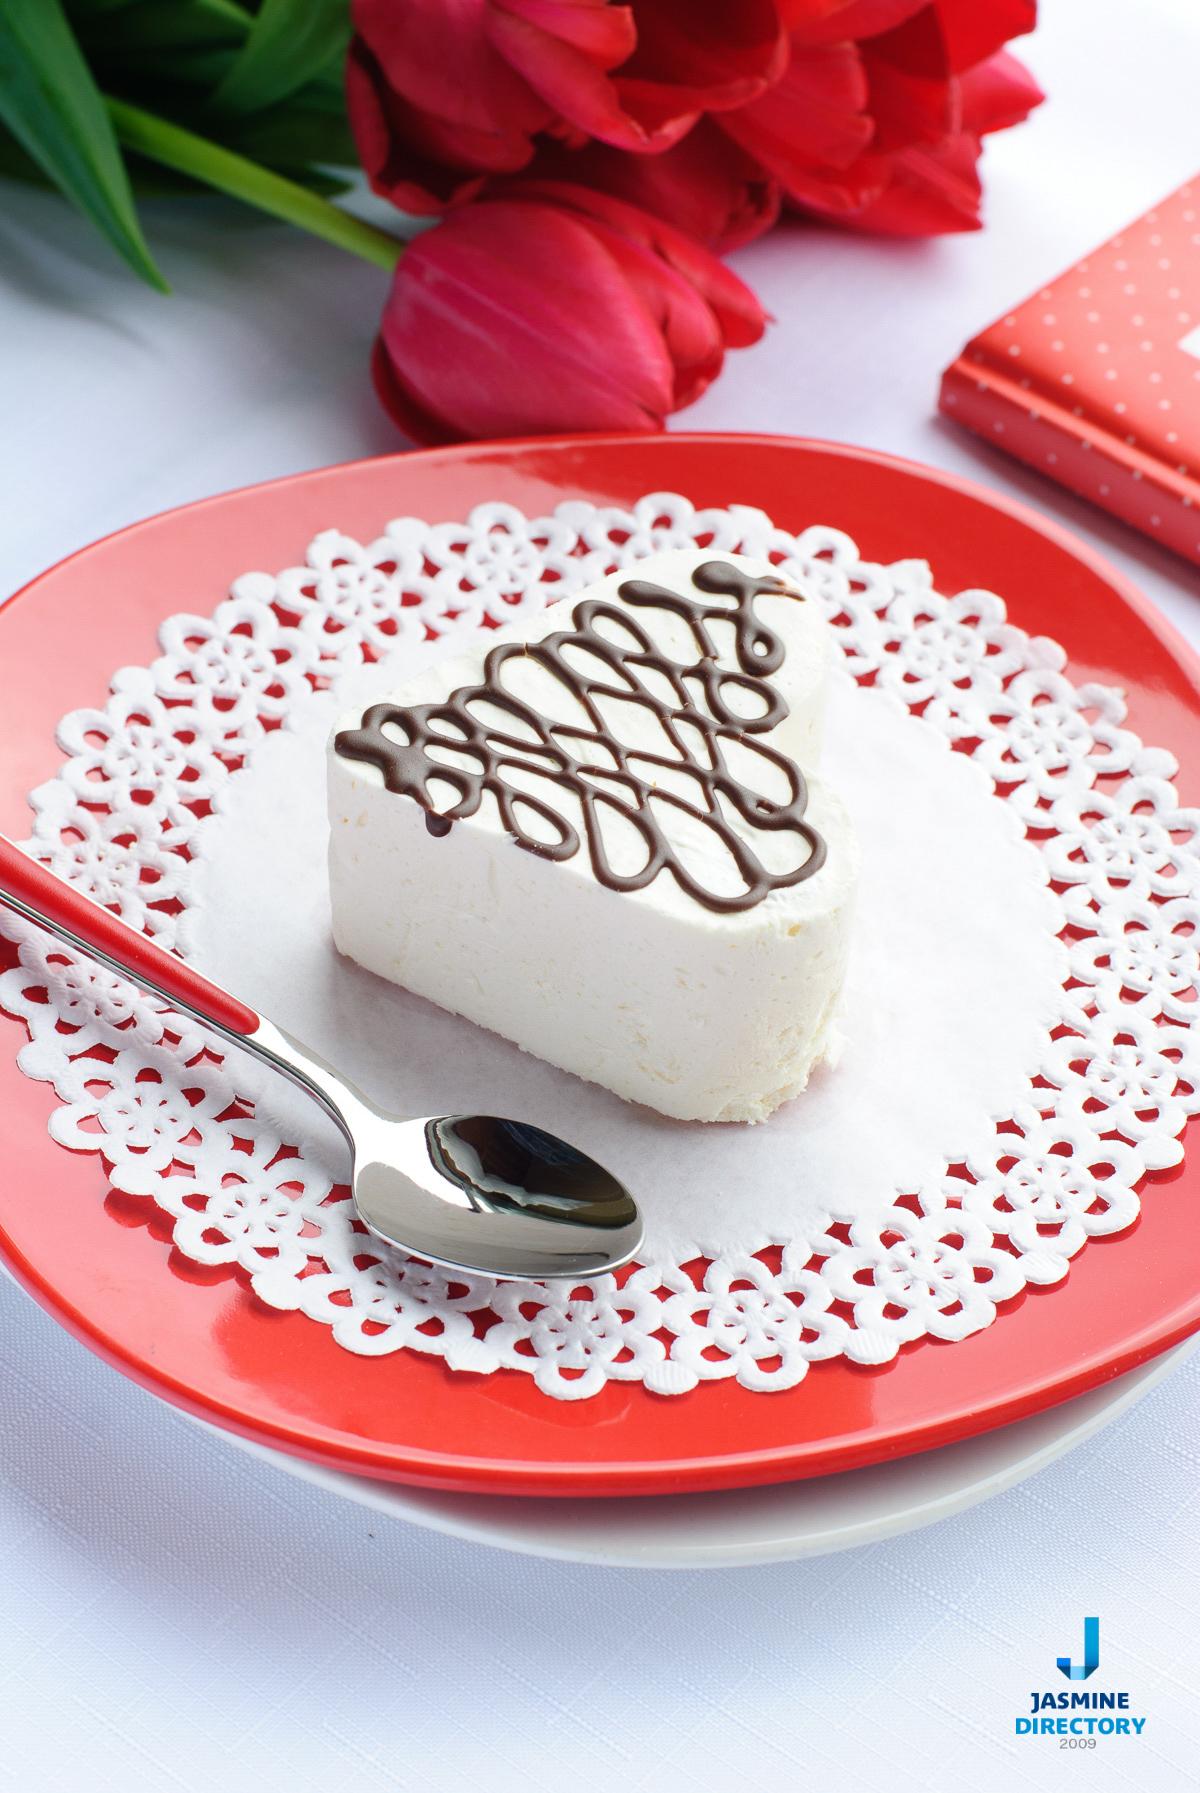 Chocolate cake - Cake